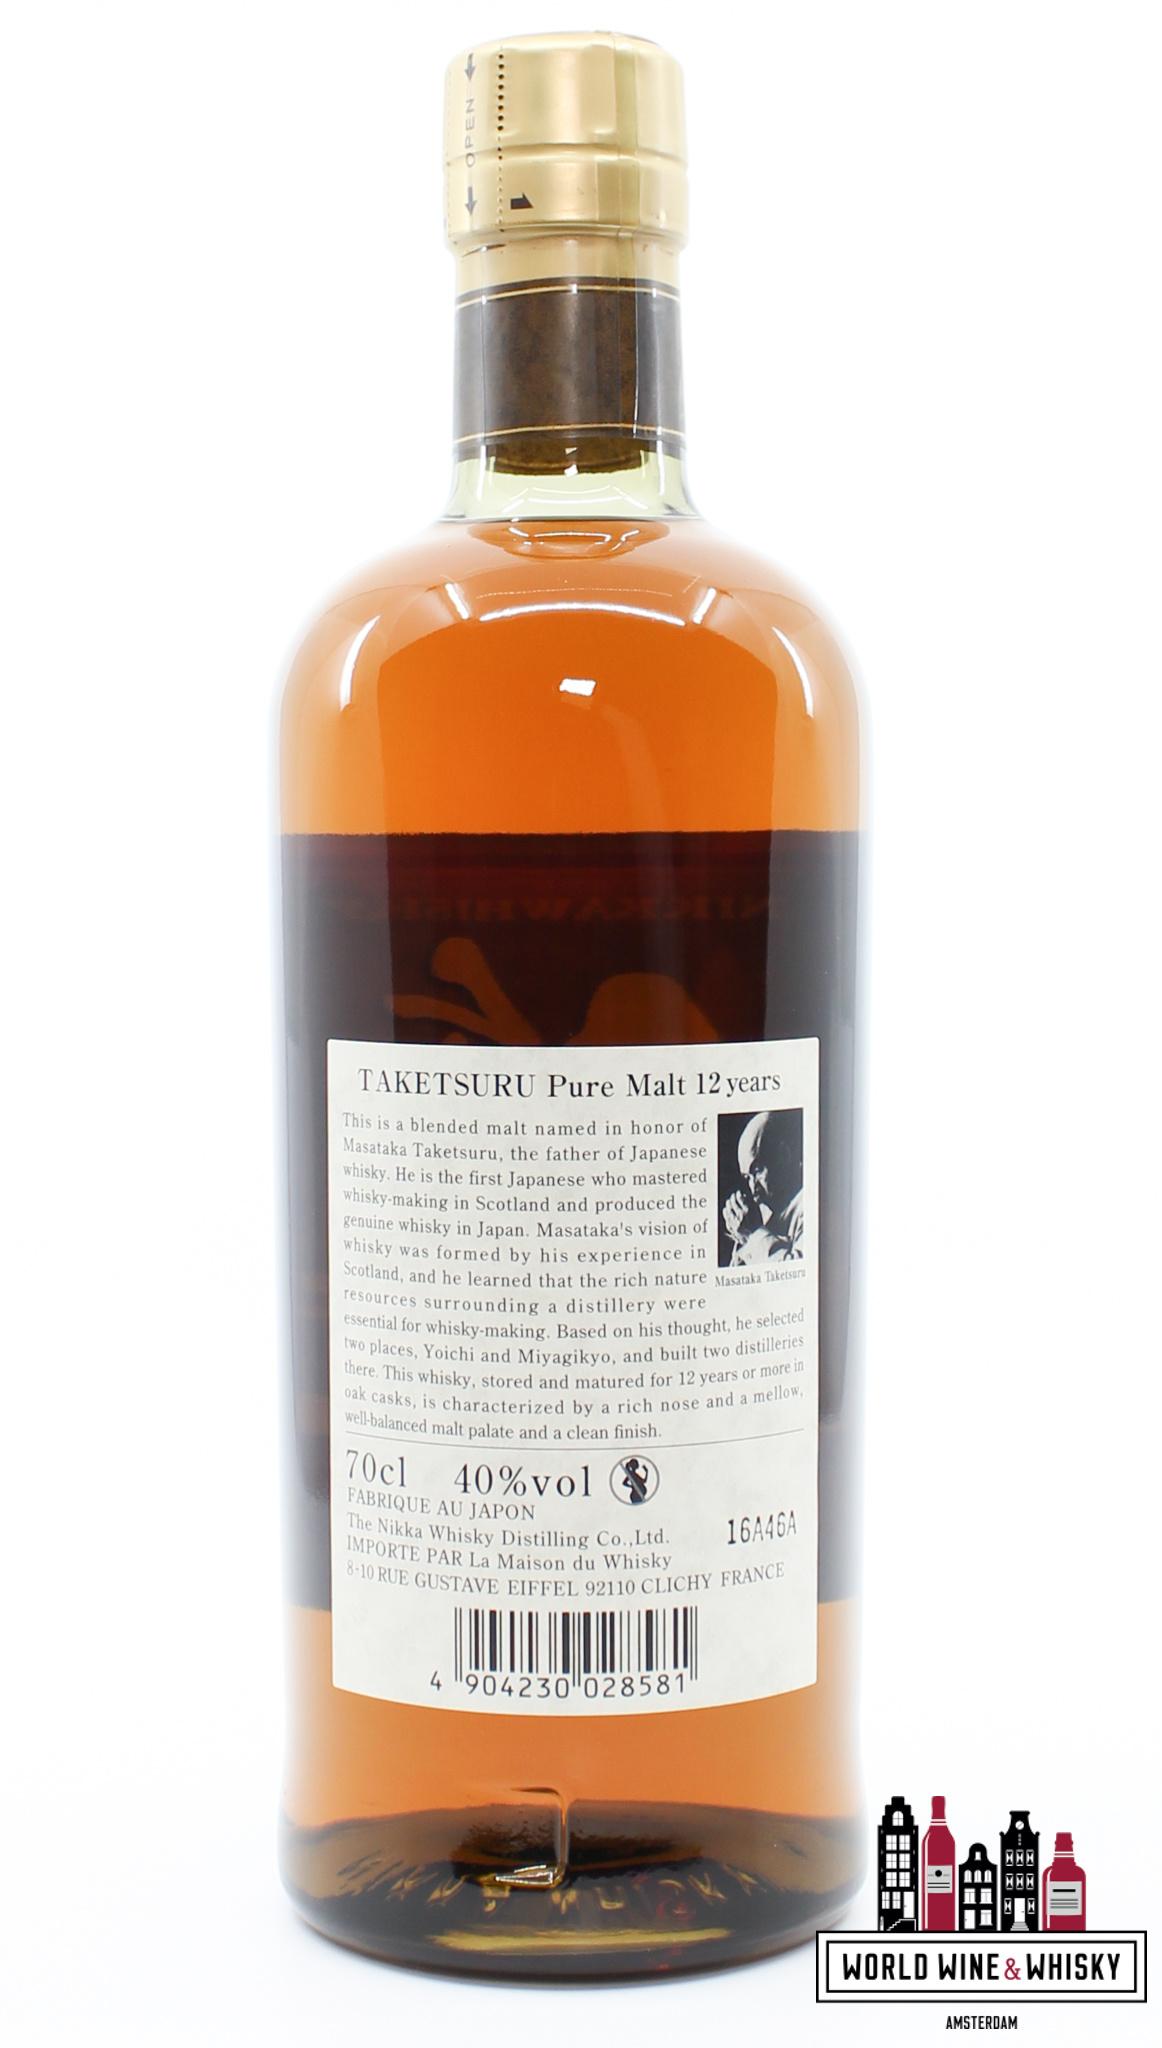 Nikka Whisky Taketsuru 12 Years Old - Pure Malt - Nikka Whisky 40%